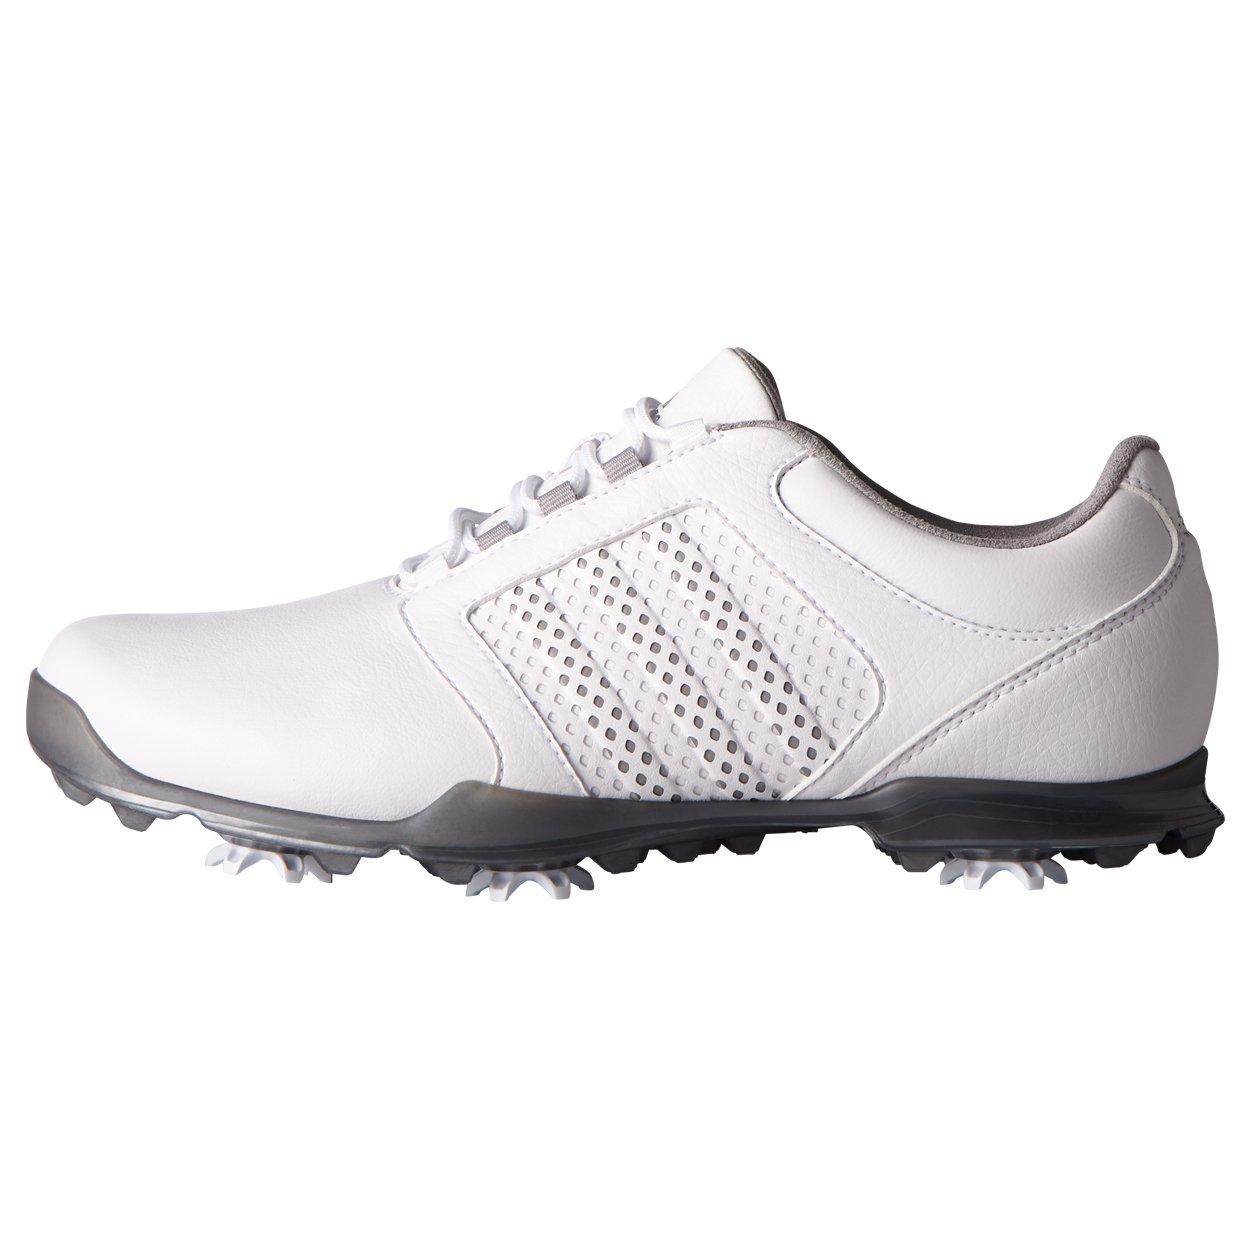 adidas Women's Adipure Tour Golf Shoe, White, 9.5 M US